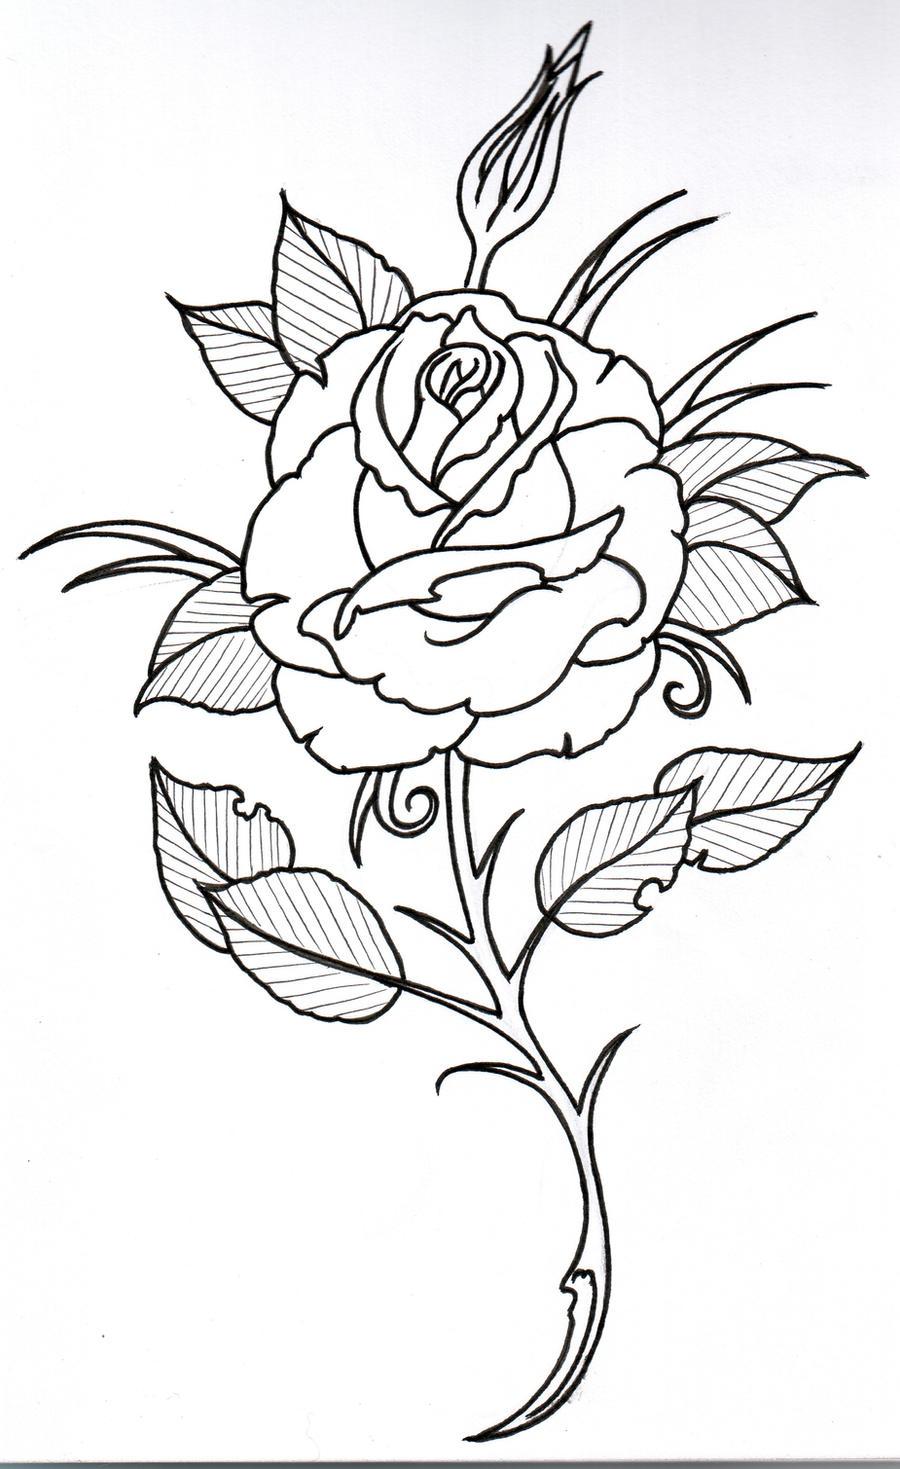 Rose Outline 3 by vikingtattoo on DeviantArt